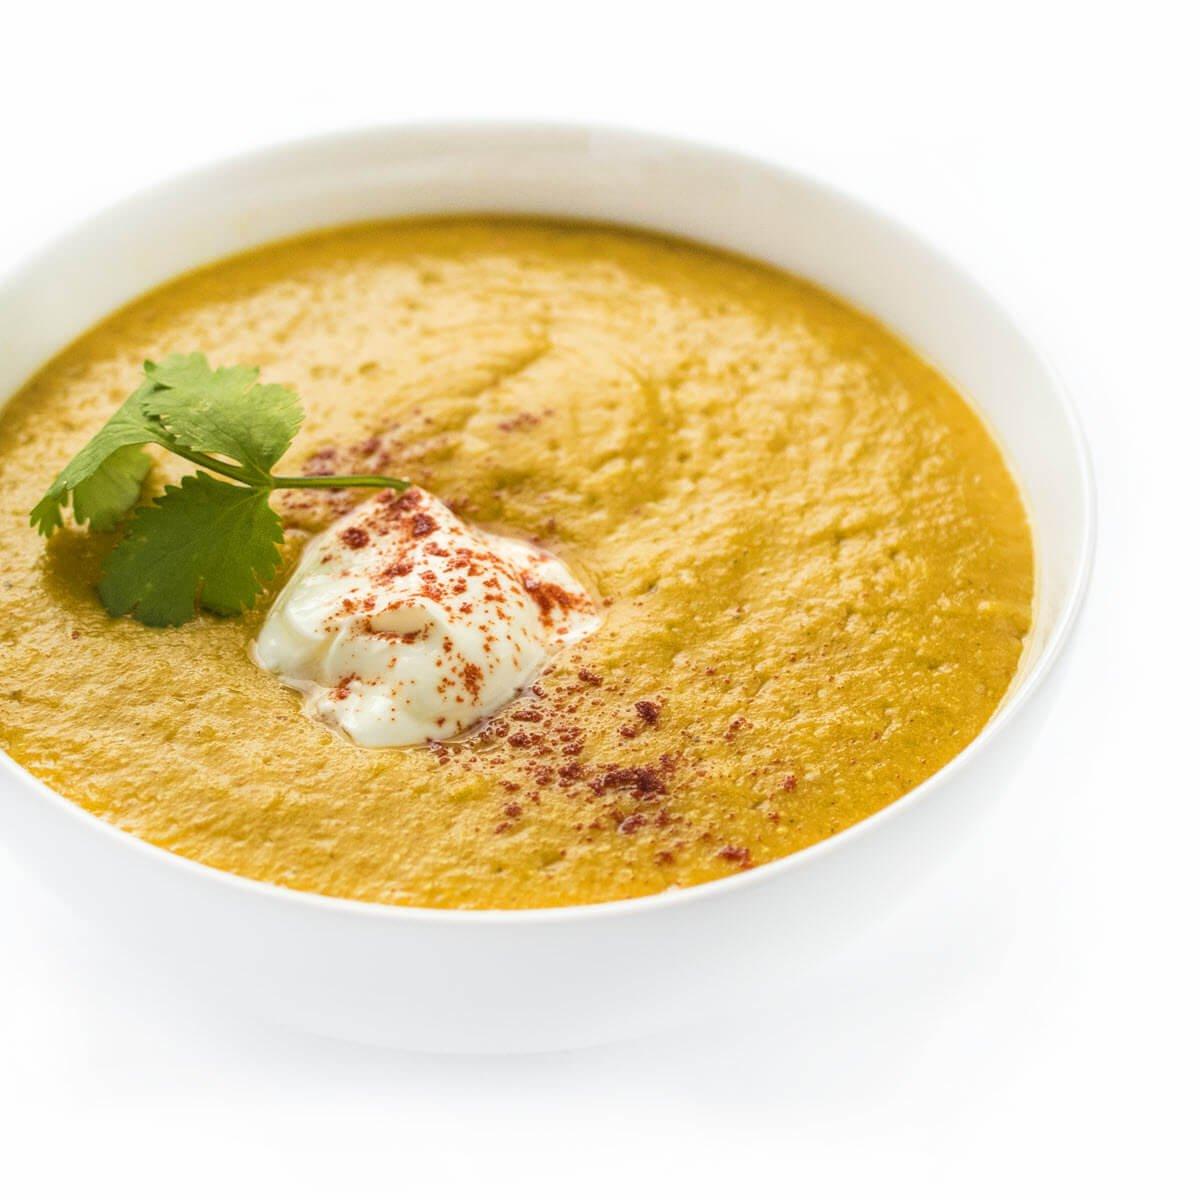 Slow Cooker Lebanese Lentil Soup in a bowl